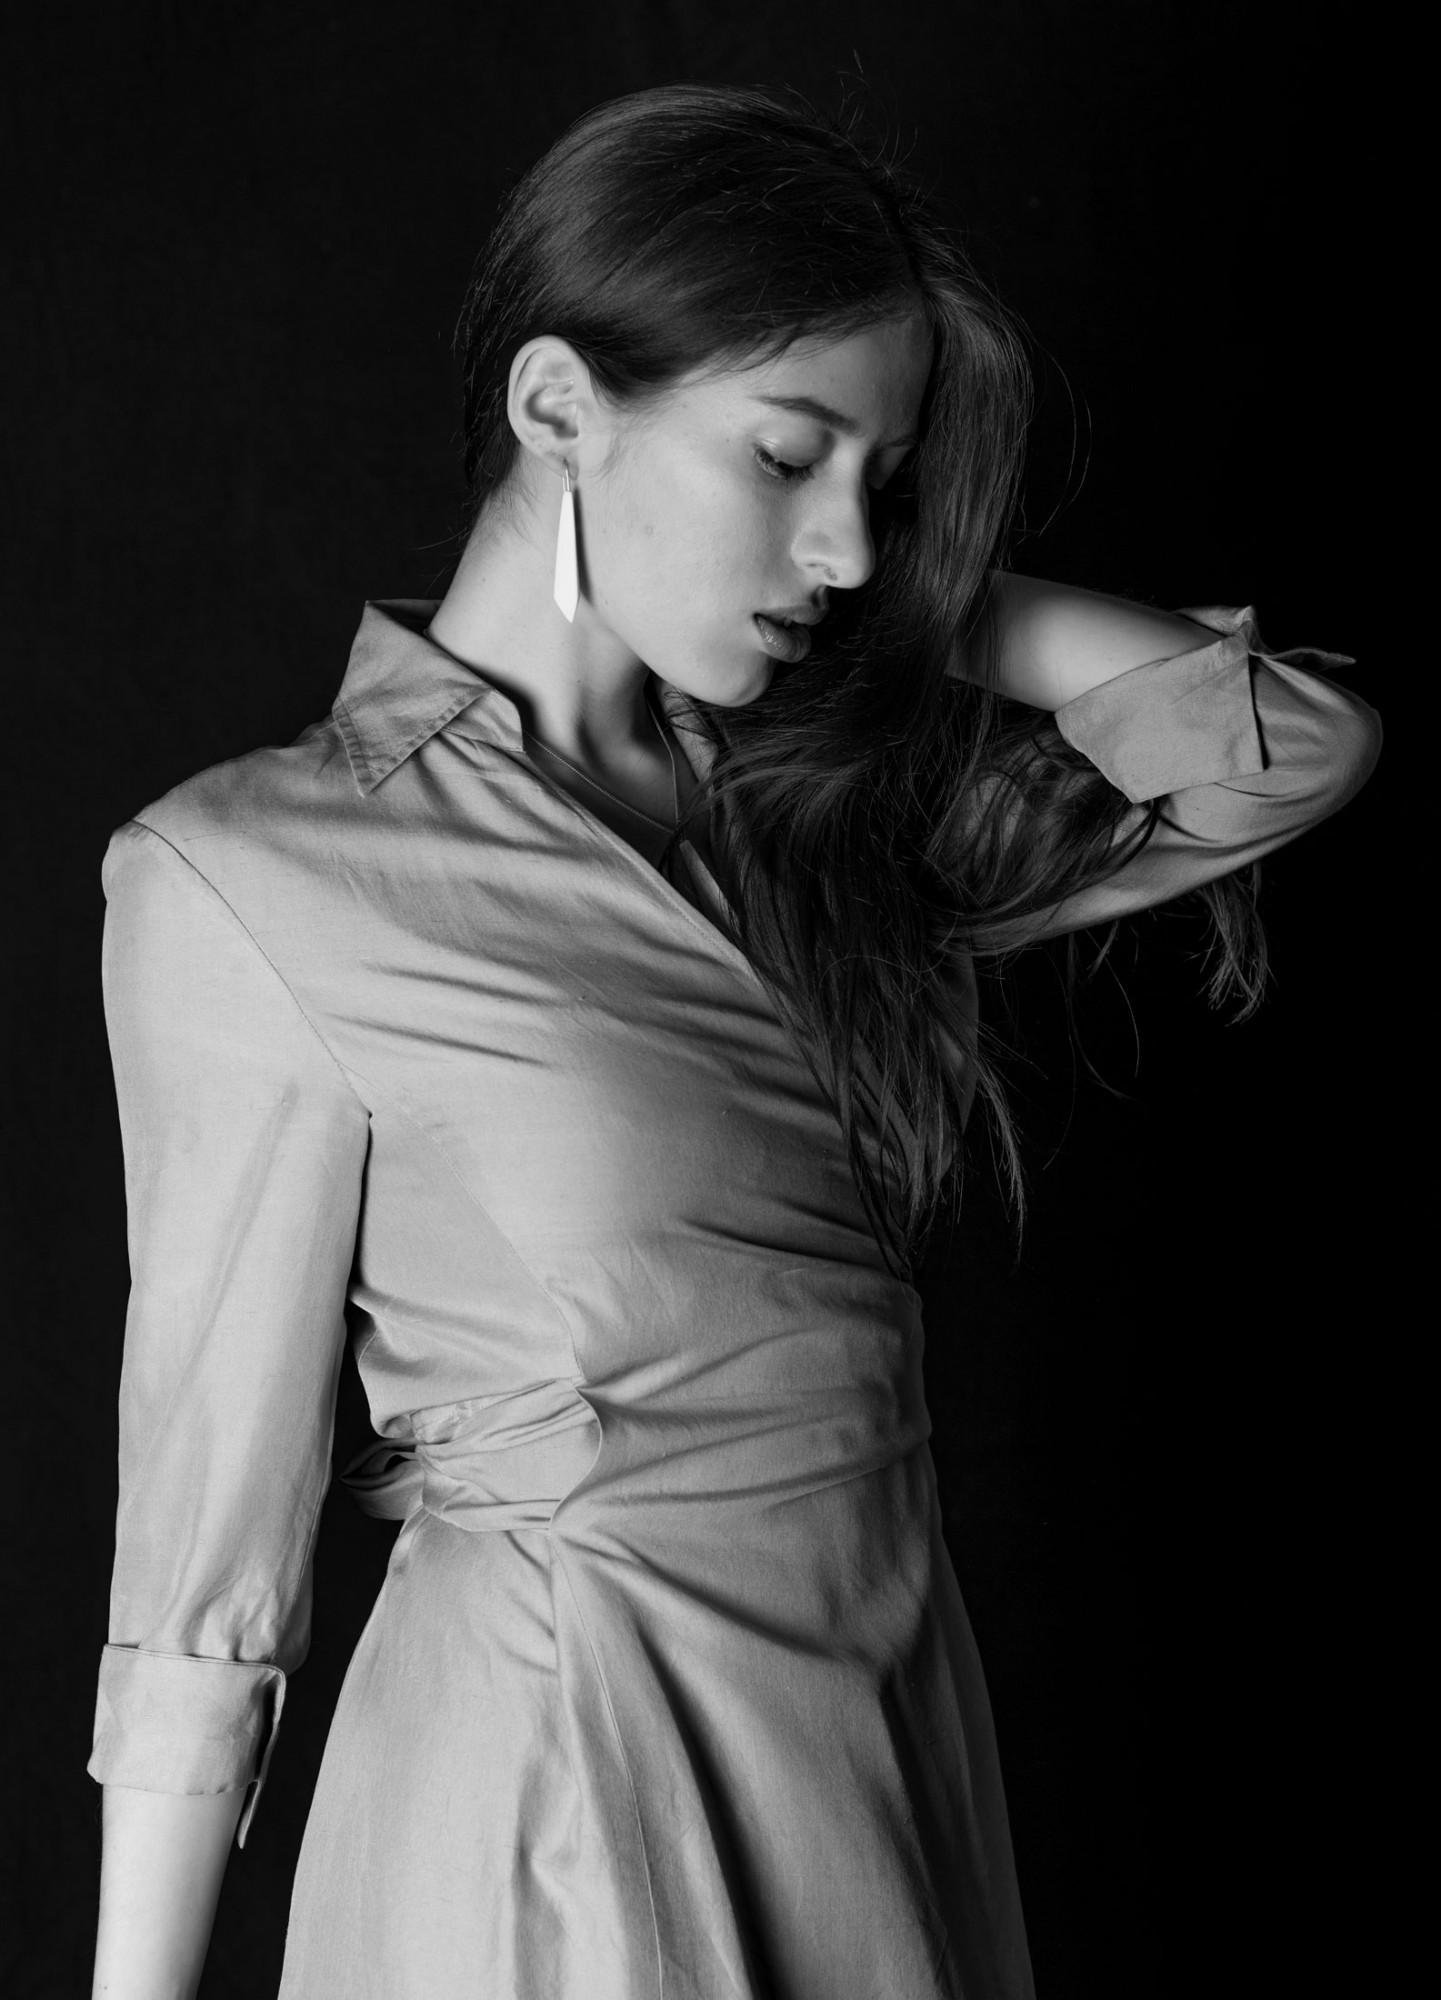 Anna-Kiryakova-Crystal-Cut-Earrings-Porzellan-Schmuck